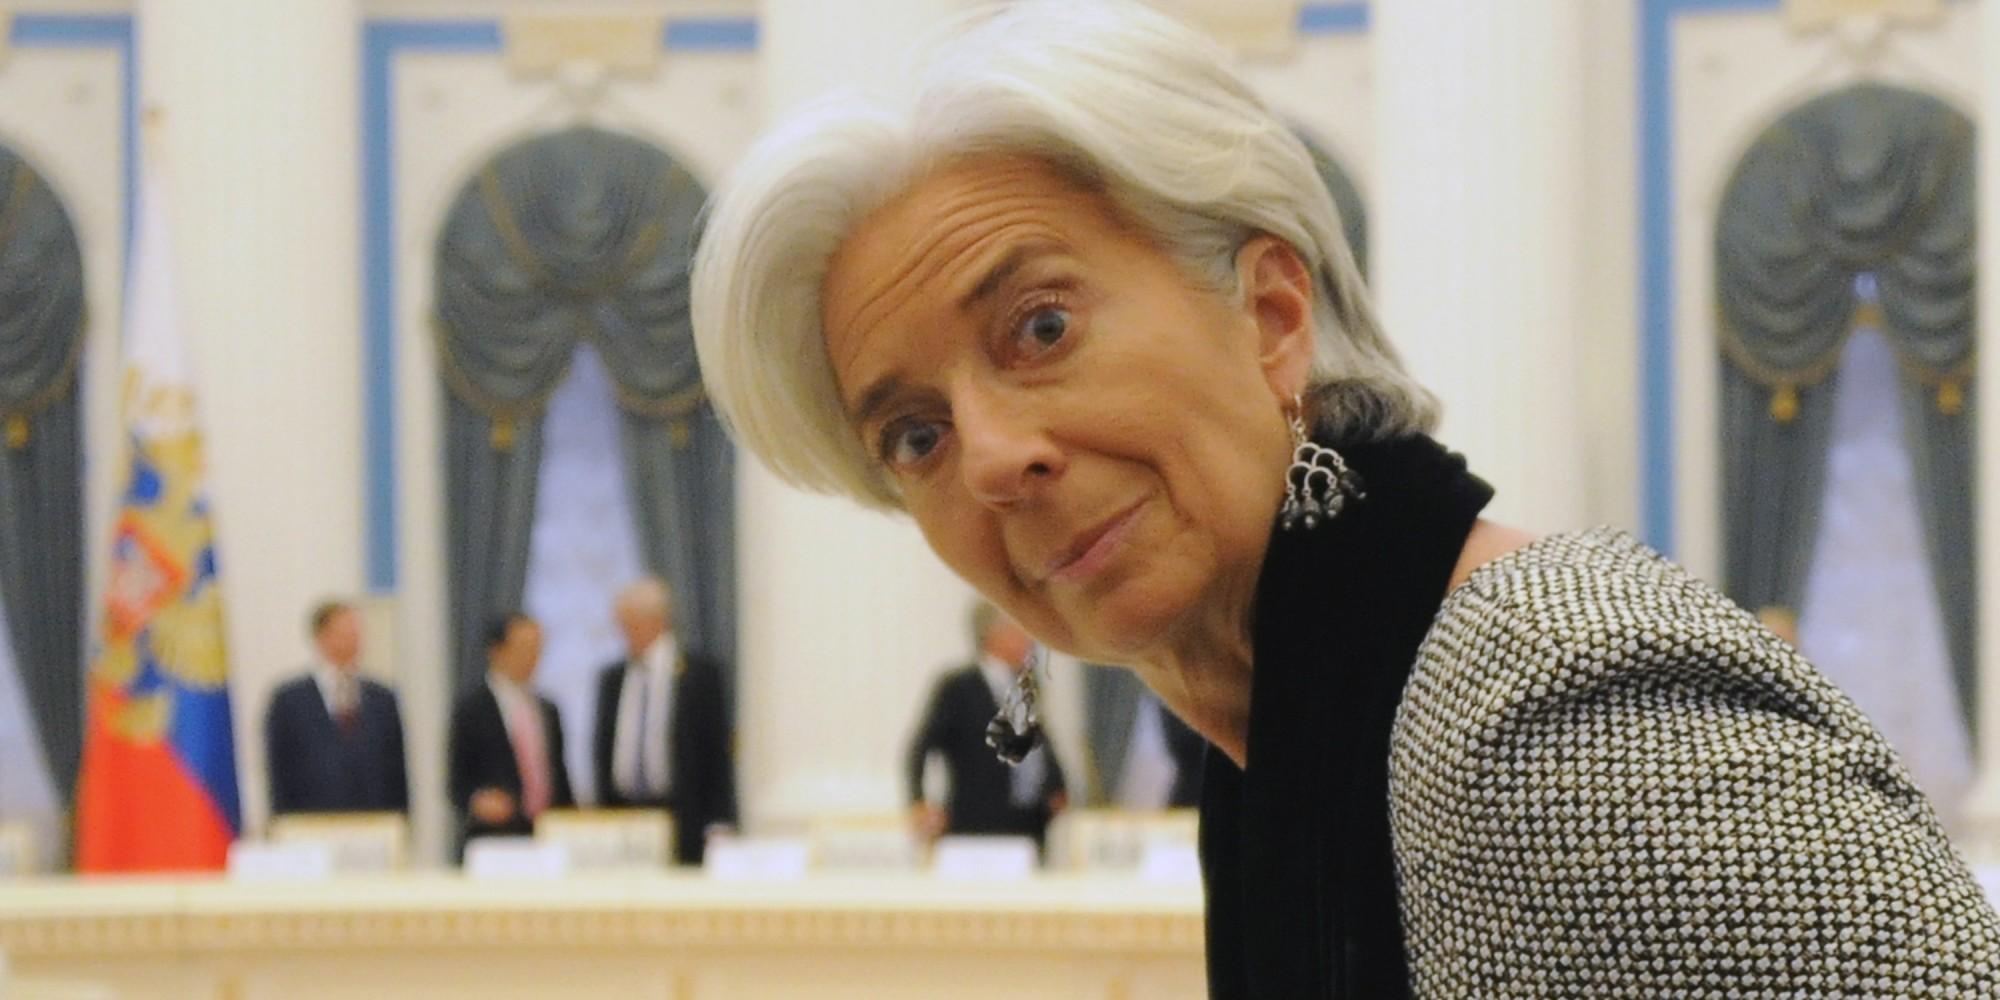 est100 一些攝影(some photos): Christine Lagarde, 拉加德